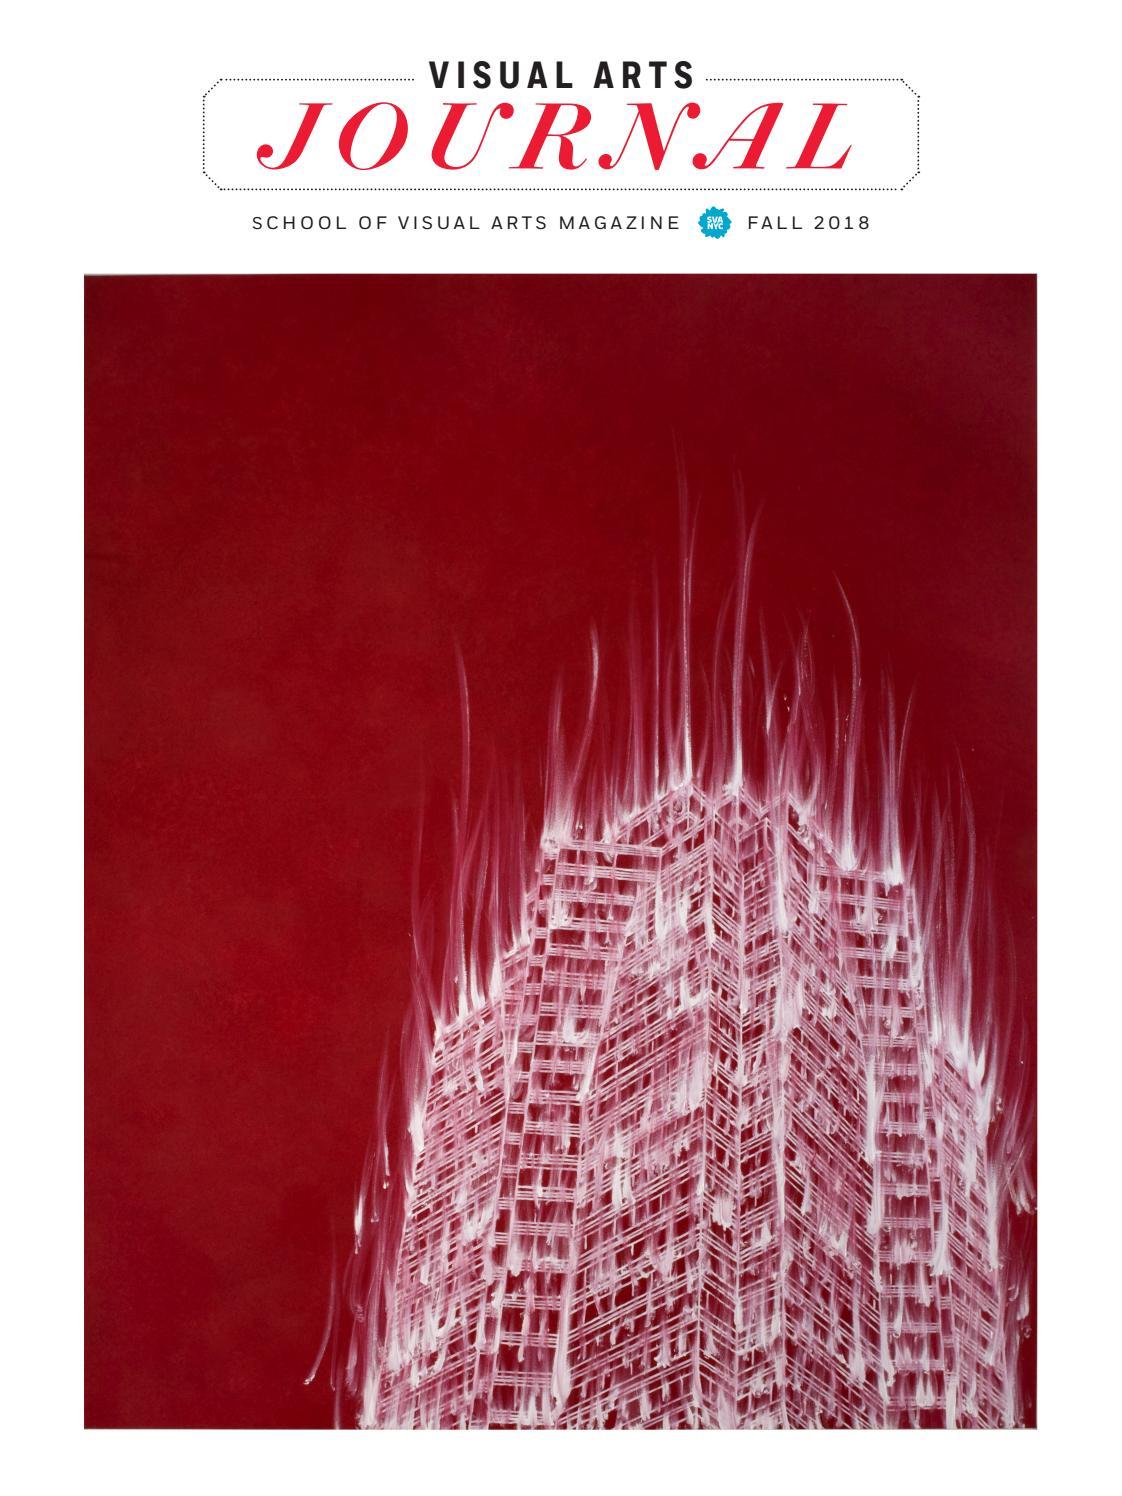 Fall 2018 By Sva Visual Arts Journal Issuu Model Railroad Electrical Wiring Nathaniel A Haas